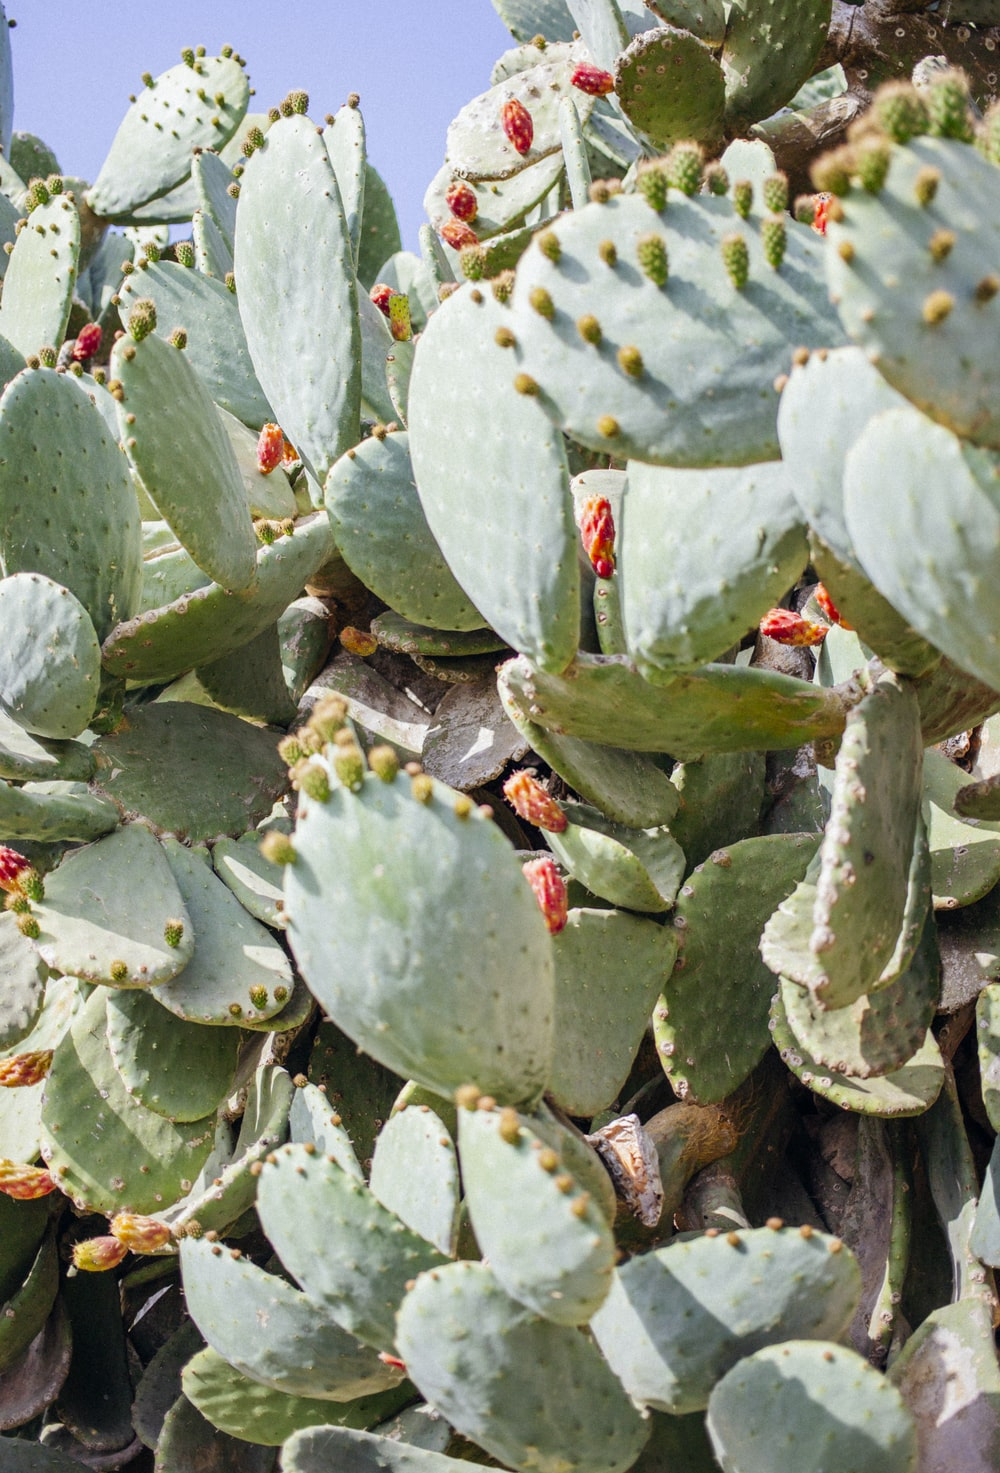 closeup photography of green cactus plant